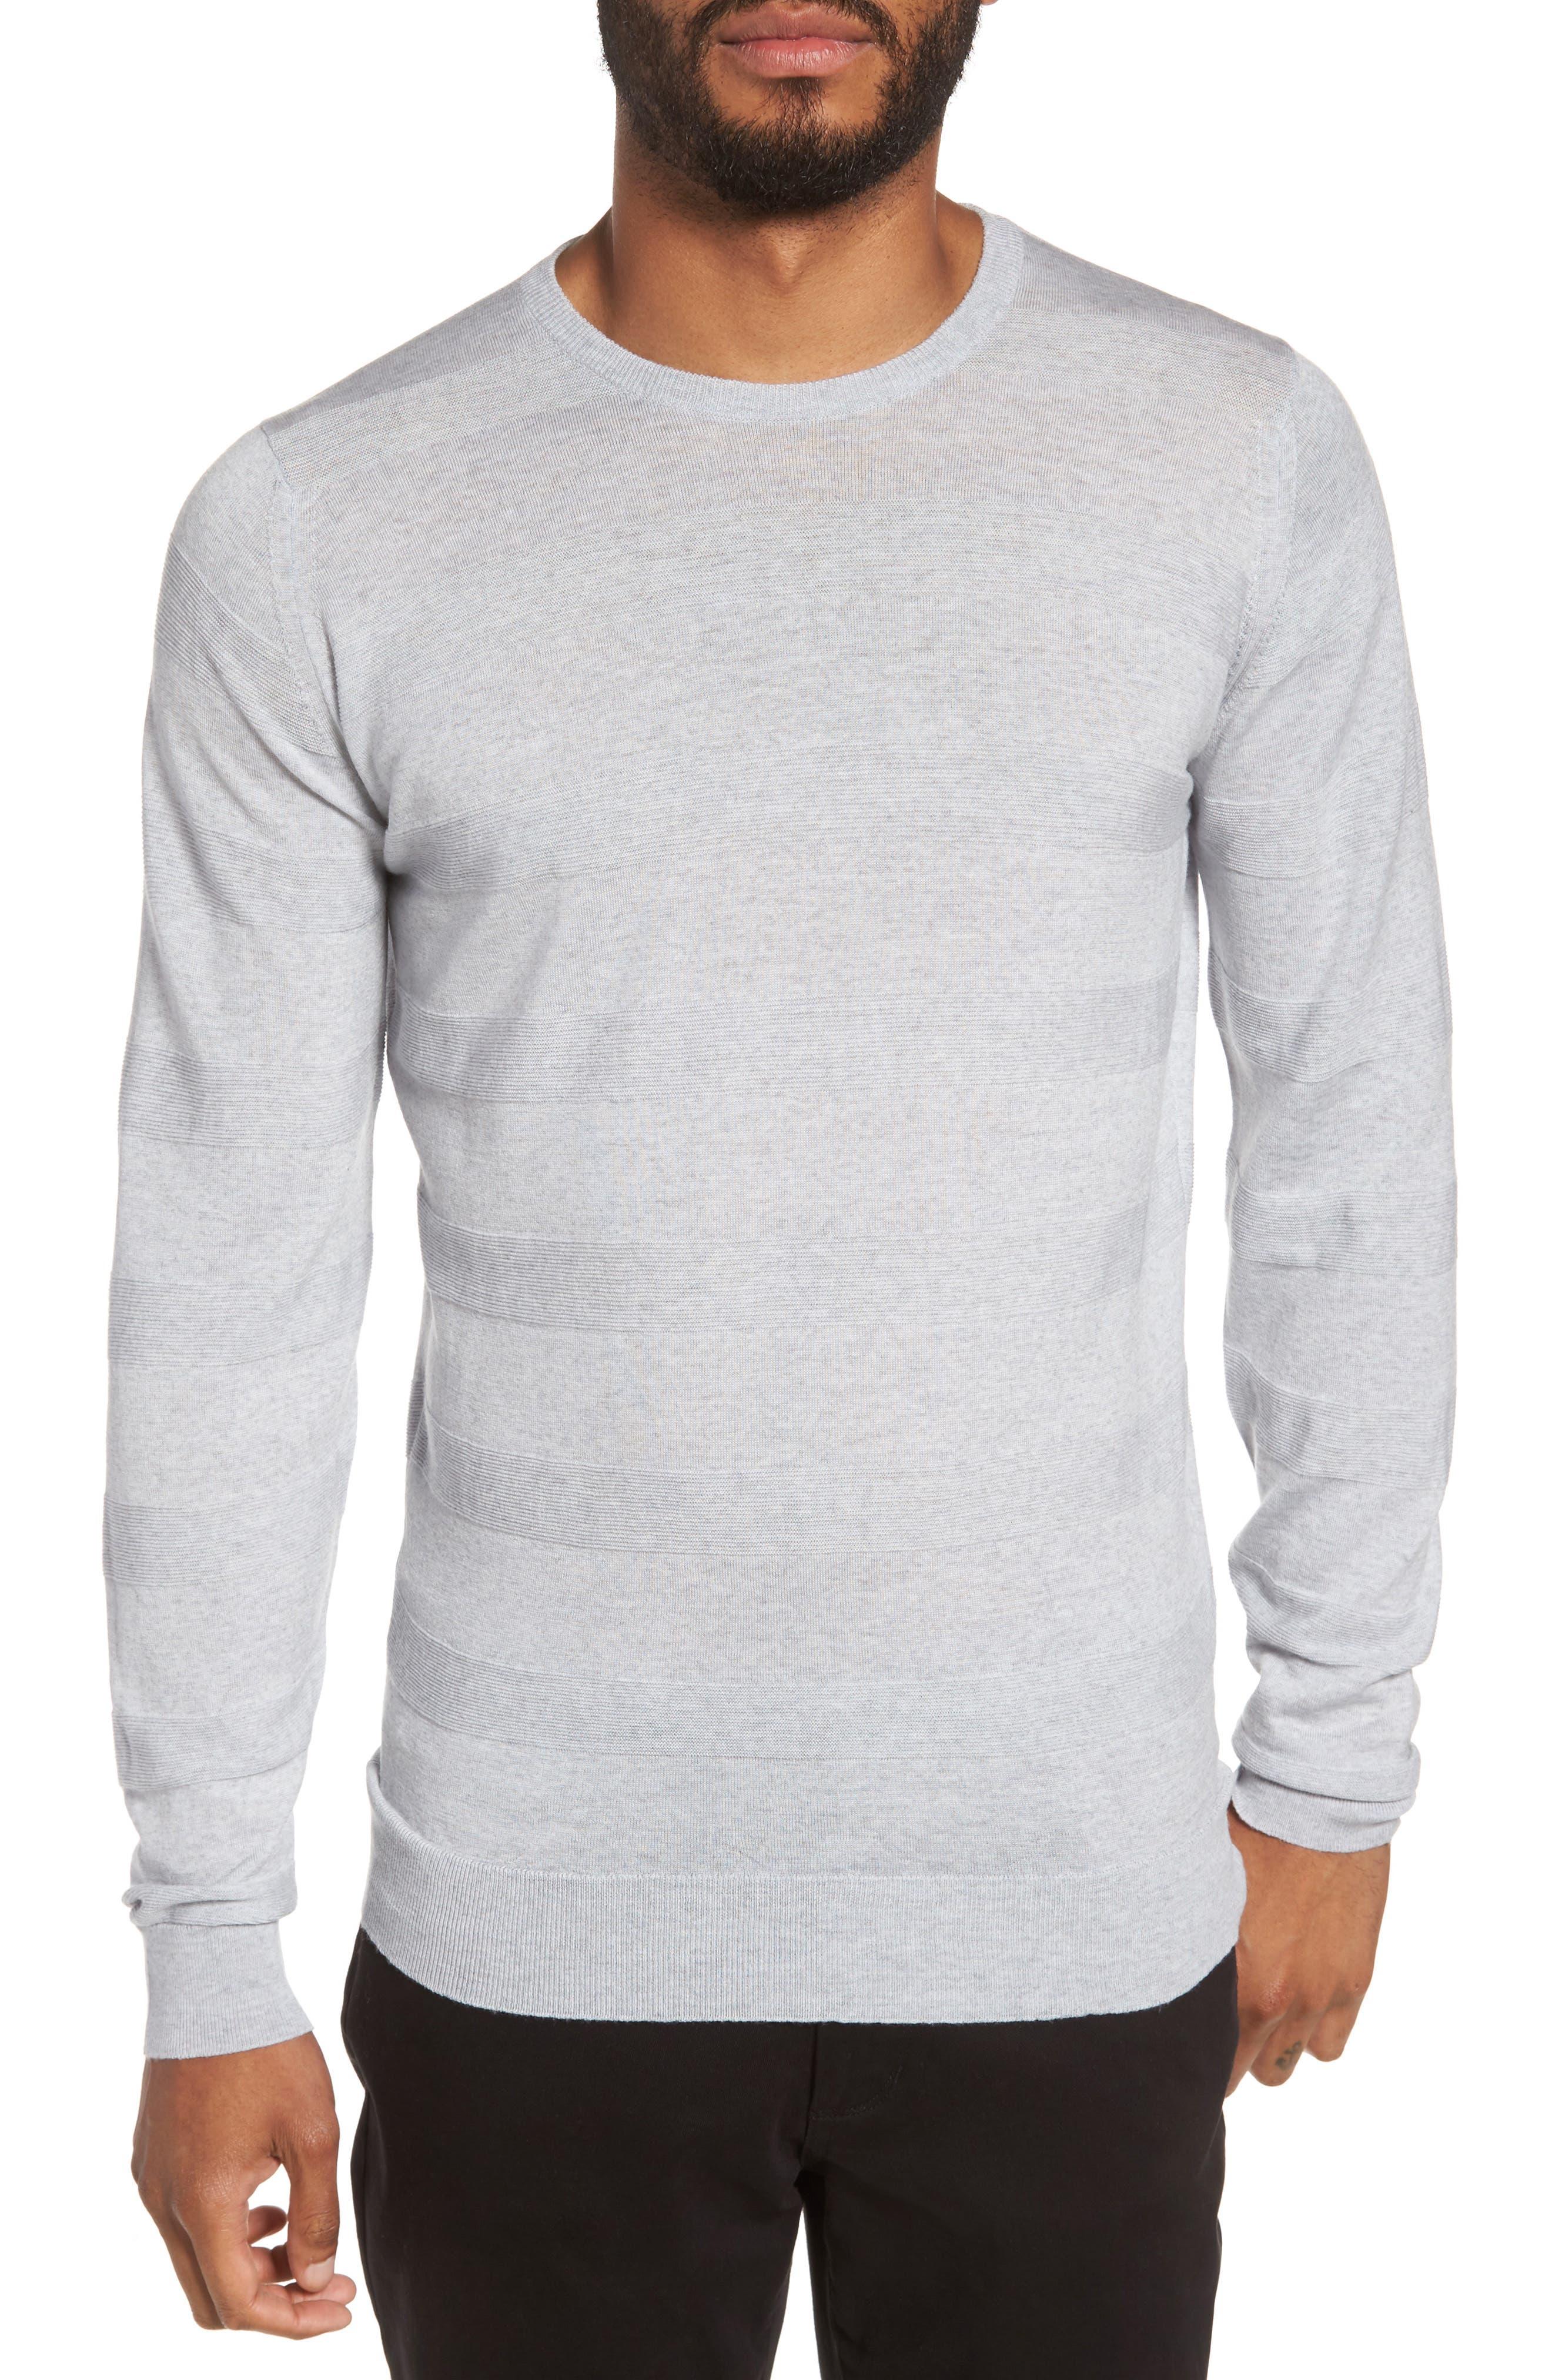 Alternate Image 1 Selected - John Smedley Standard Fit Merino Wool Sweater